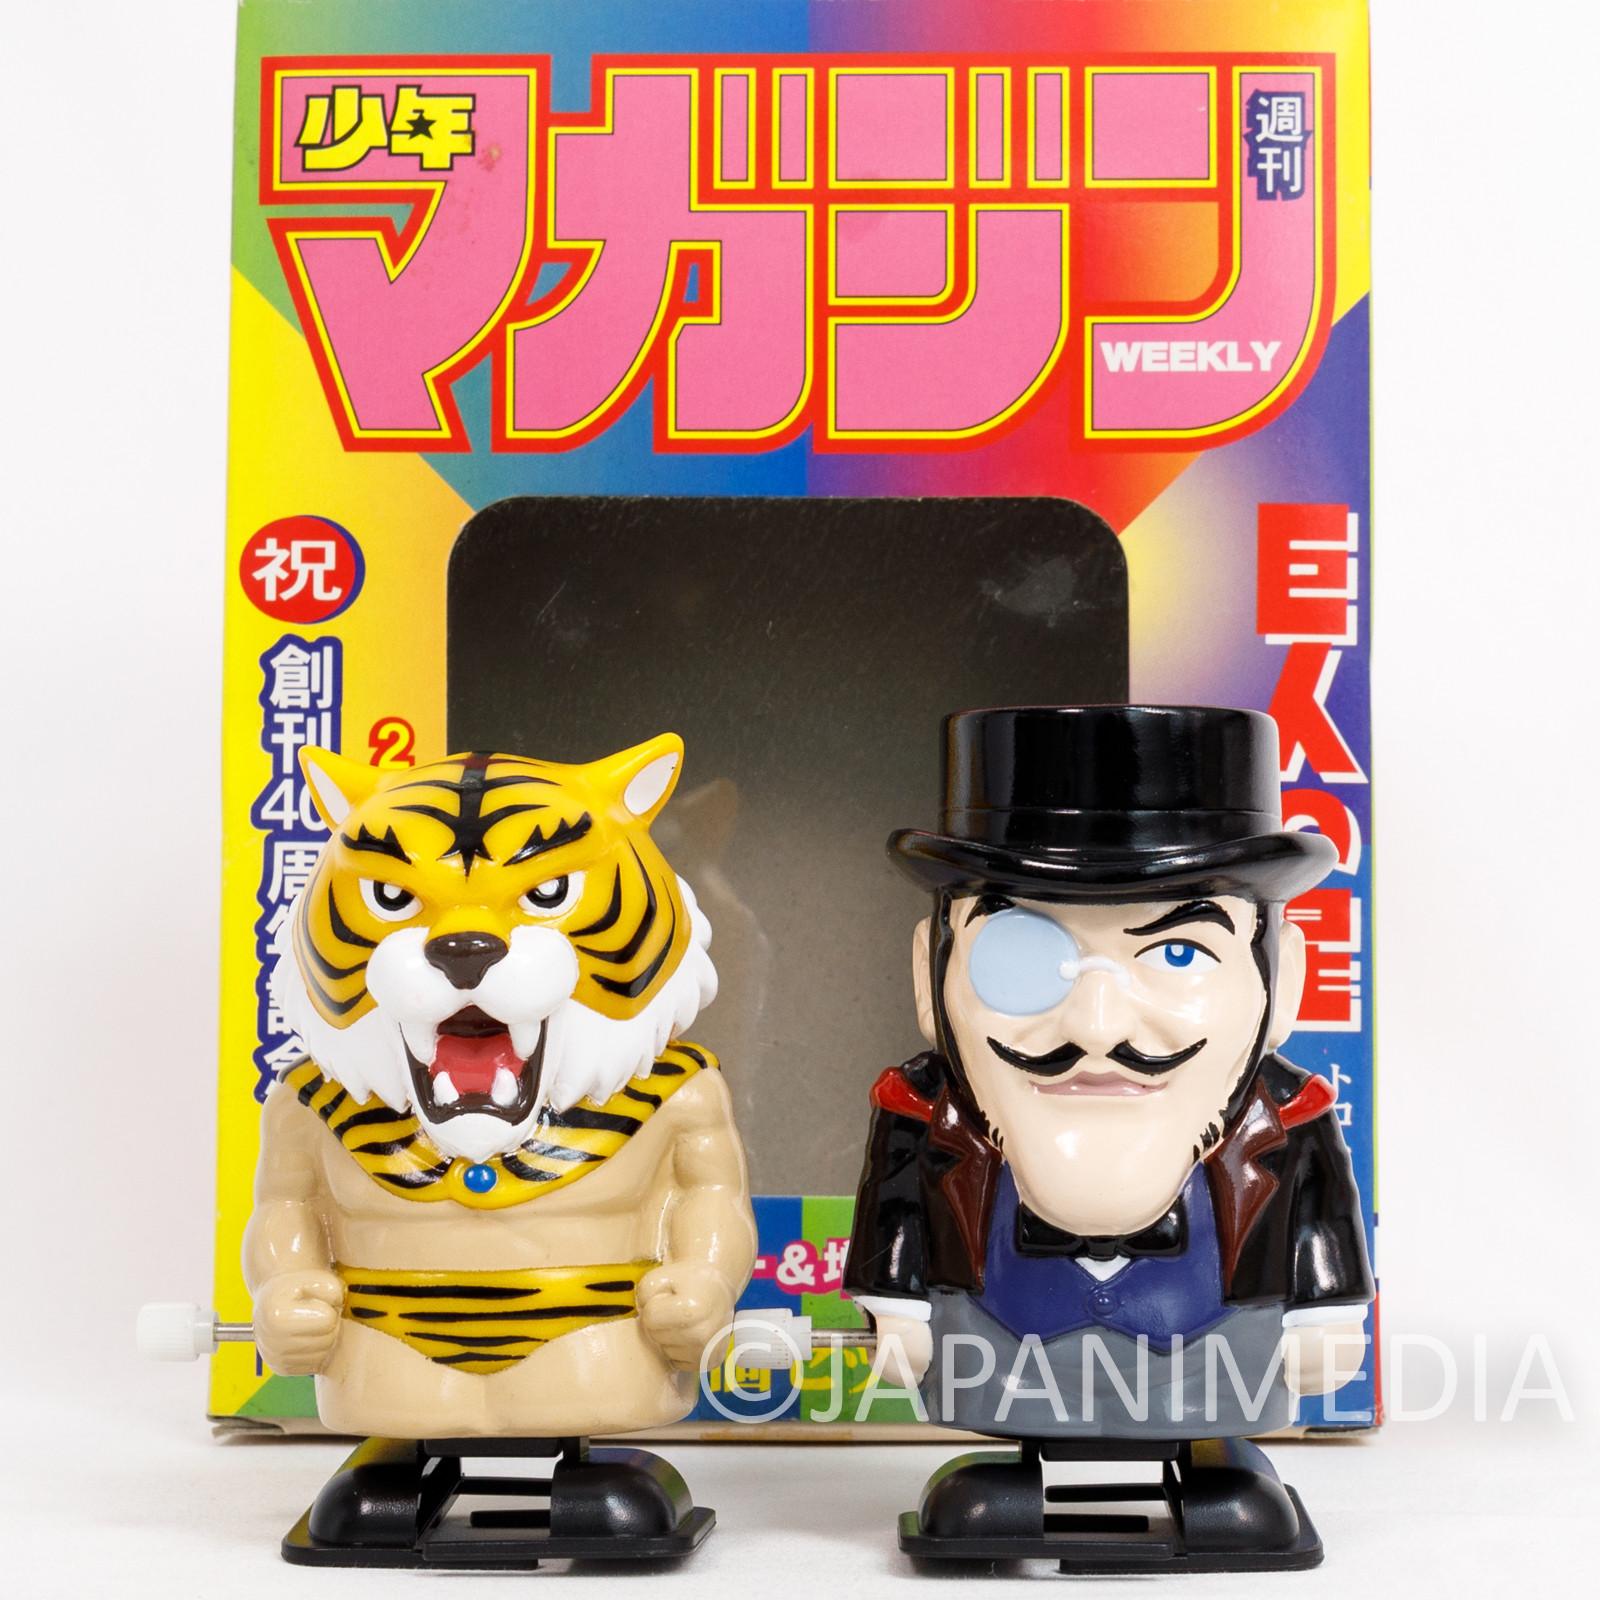 Tiger Mask & Mister X Wind-up Figure Toy JAPAN ANIME MANGA Pro Wrestling